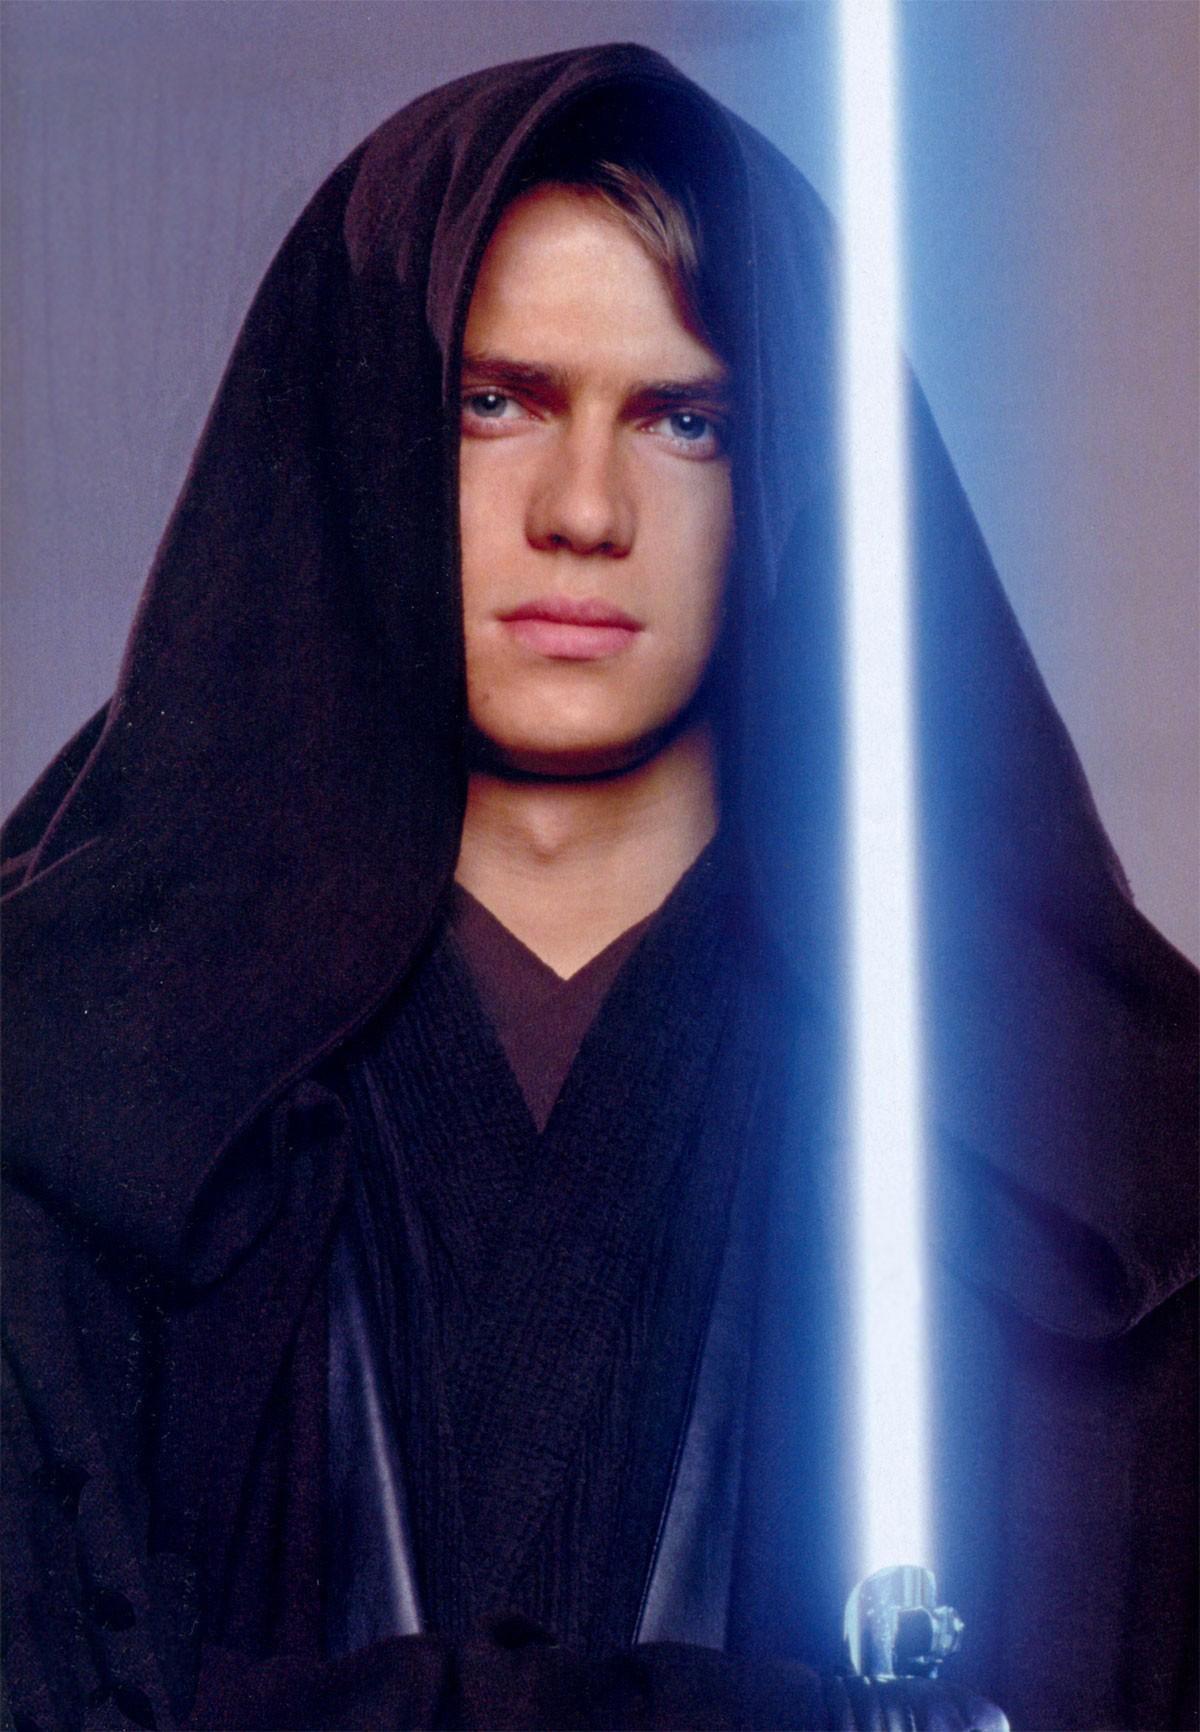 Pin By Erika Blake On Star Wars Movies Cast Promotional Photos Star Wars Nerd Star Wars Anakin Star Wars Geek